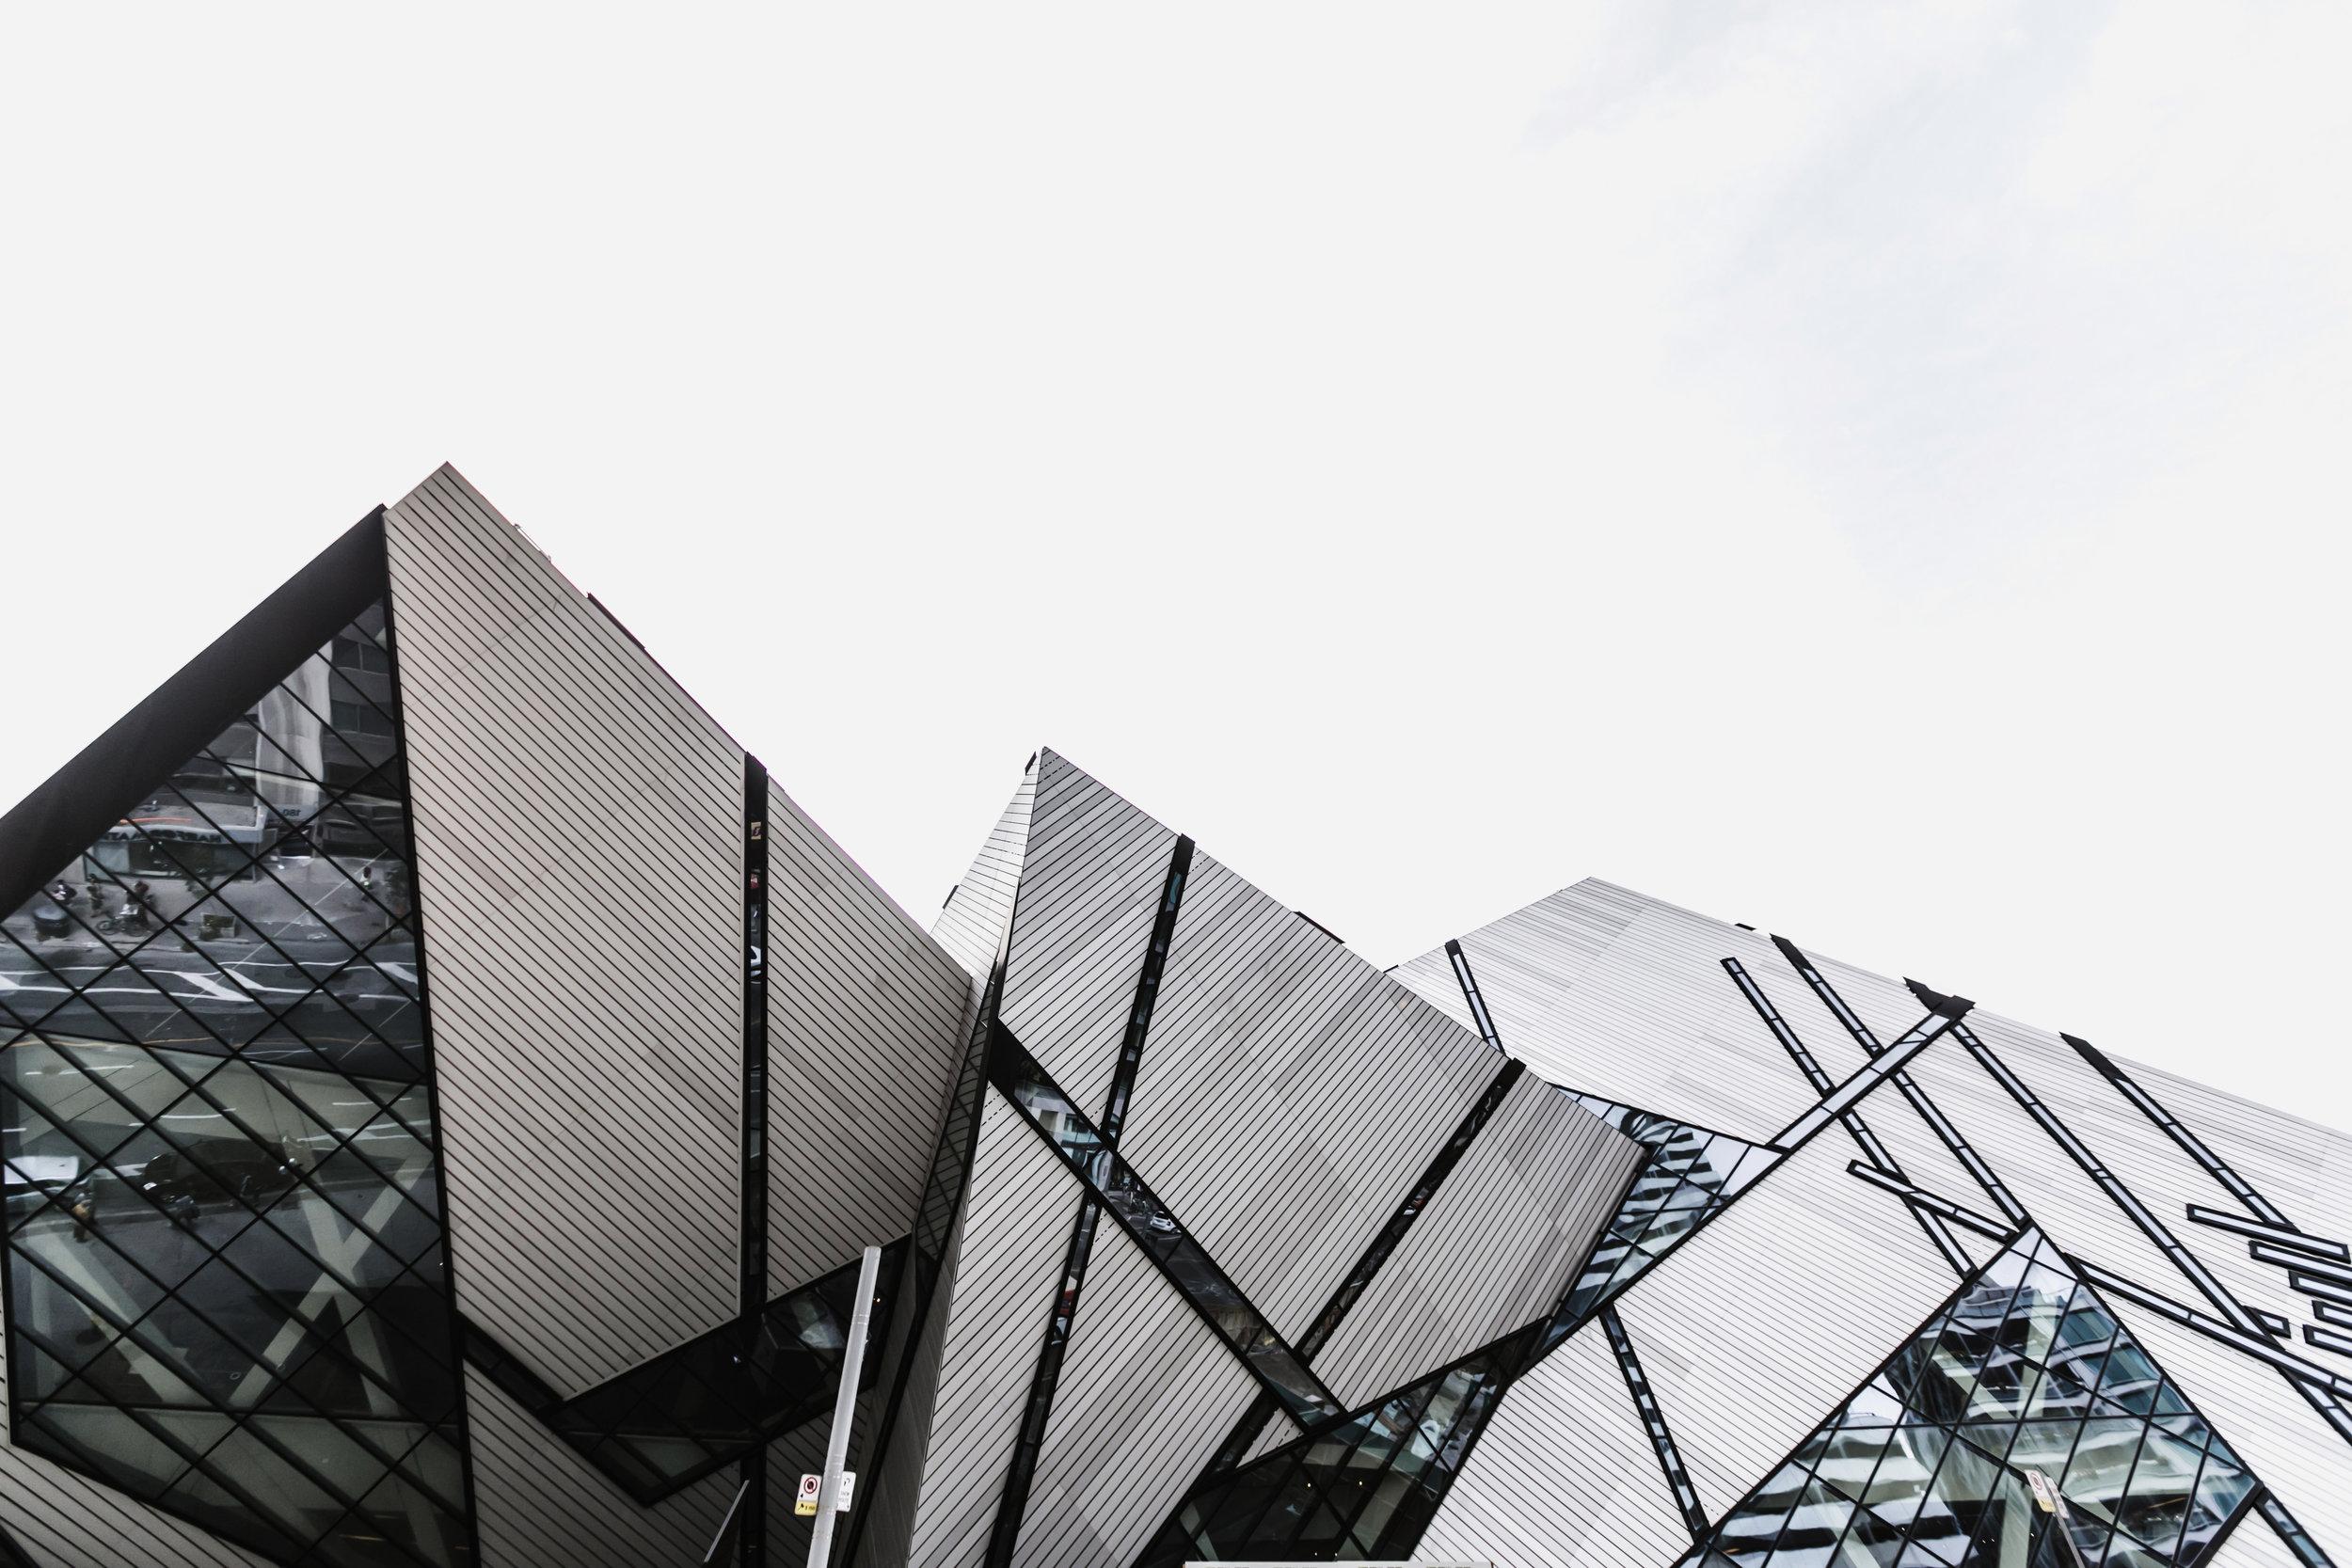 121_bloor_KaylaRocca_Toronto_Photography_T6A6185.jpg